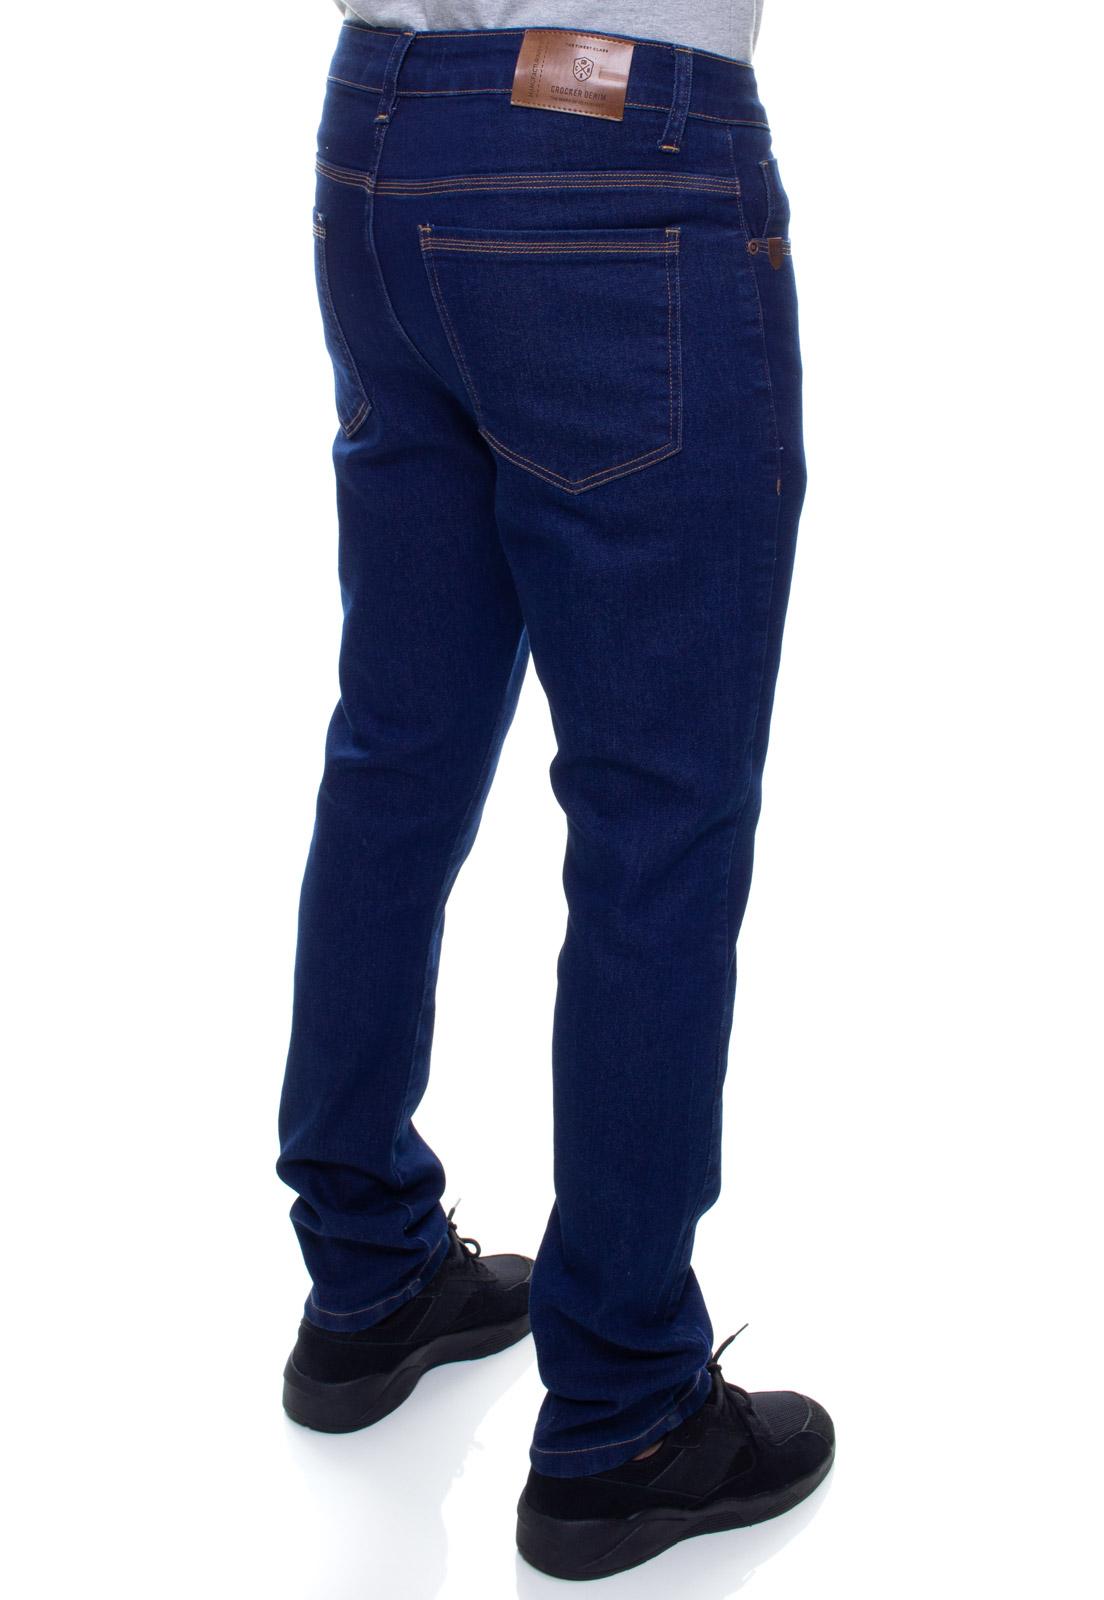 Calça Confort Jeans Masculina Crocker - 48137  - CROCKER JEANS